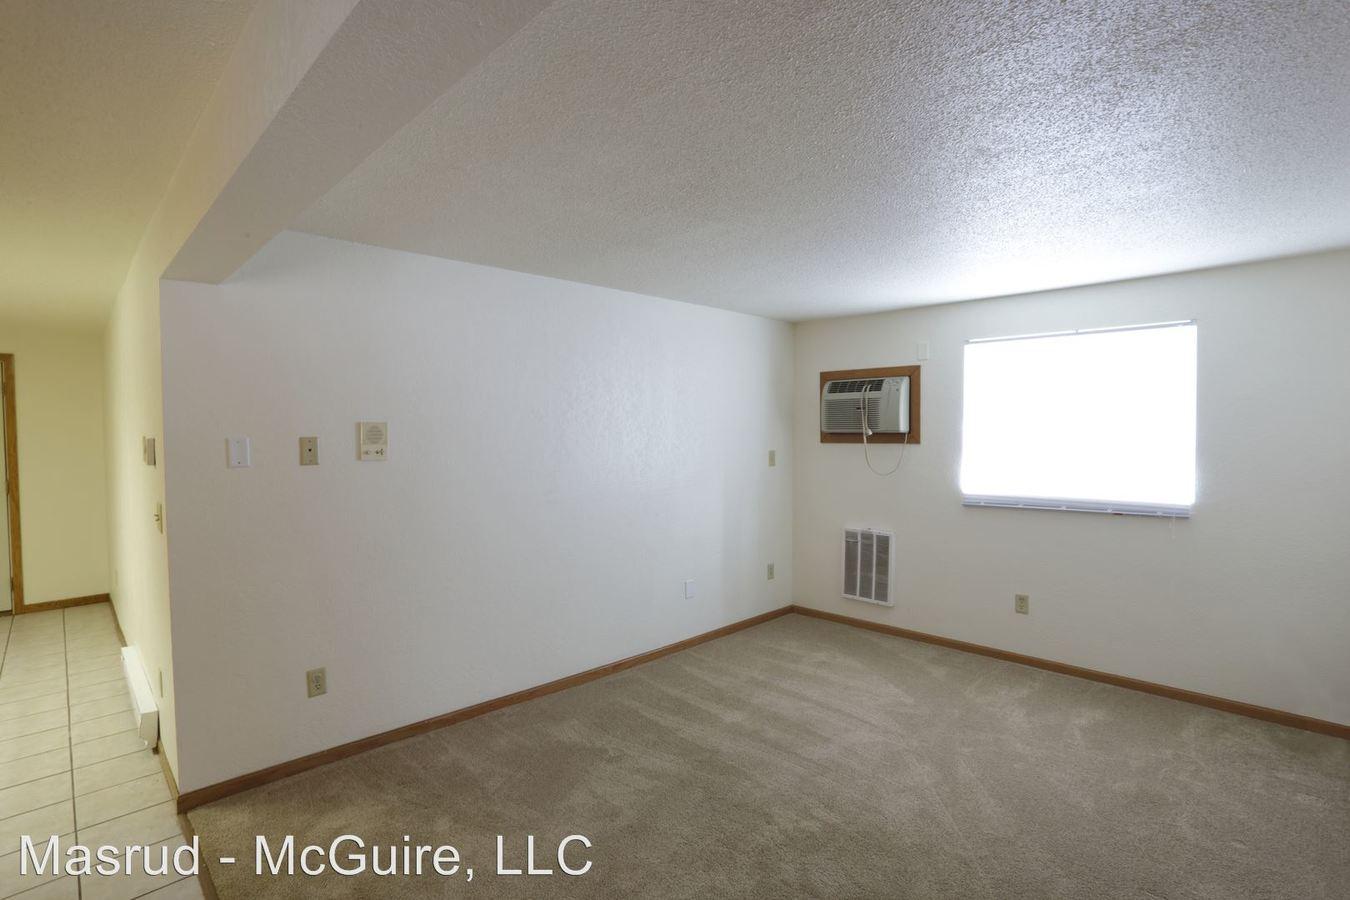 2 Bedrooms 1 Bathroom Apartment for rent at 150 Sumner Street in La Crosse, WI